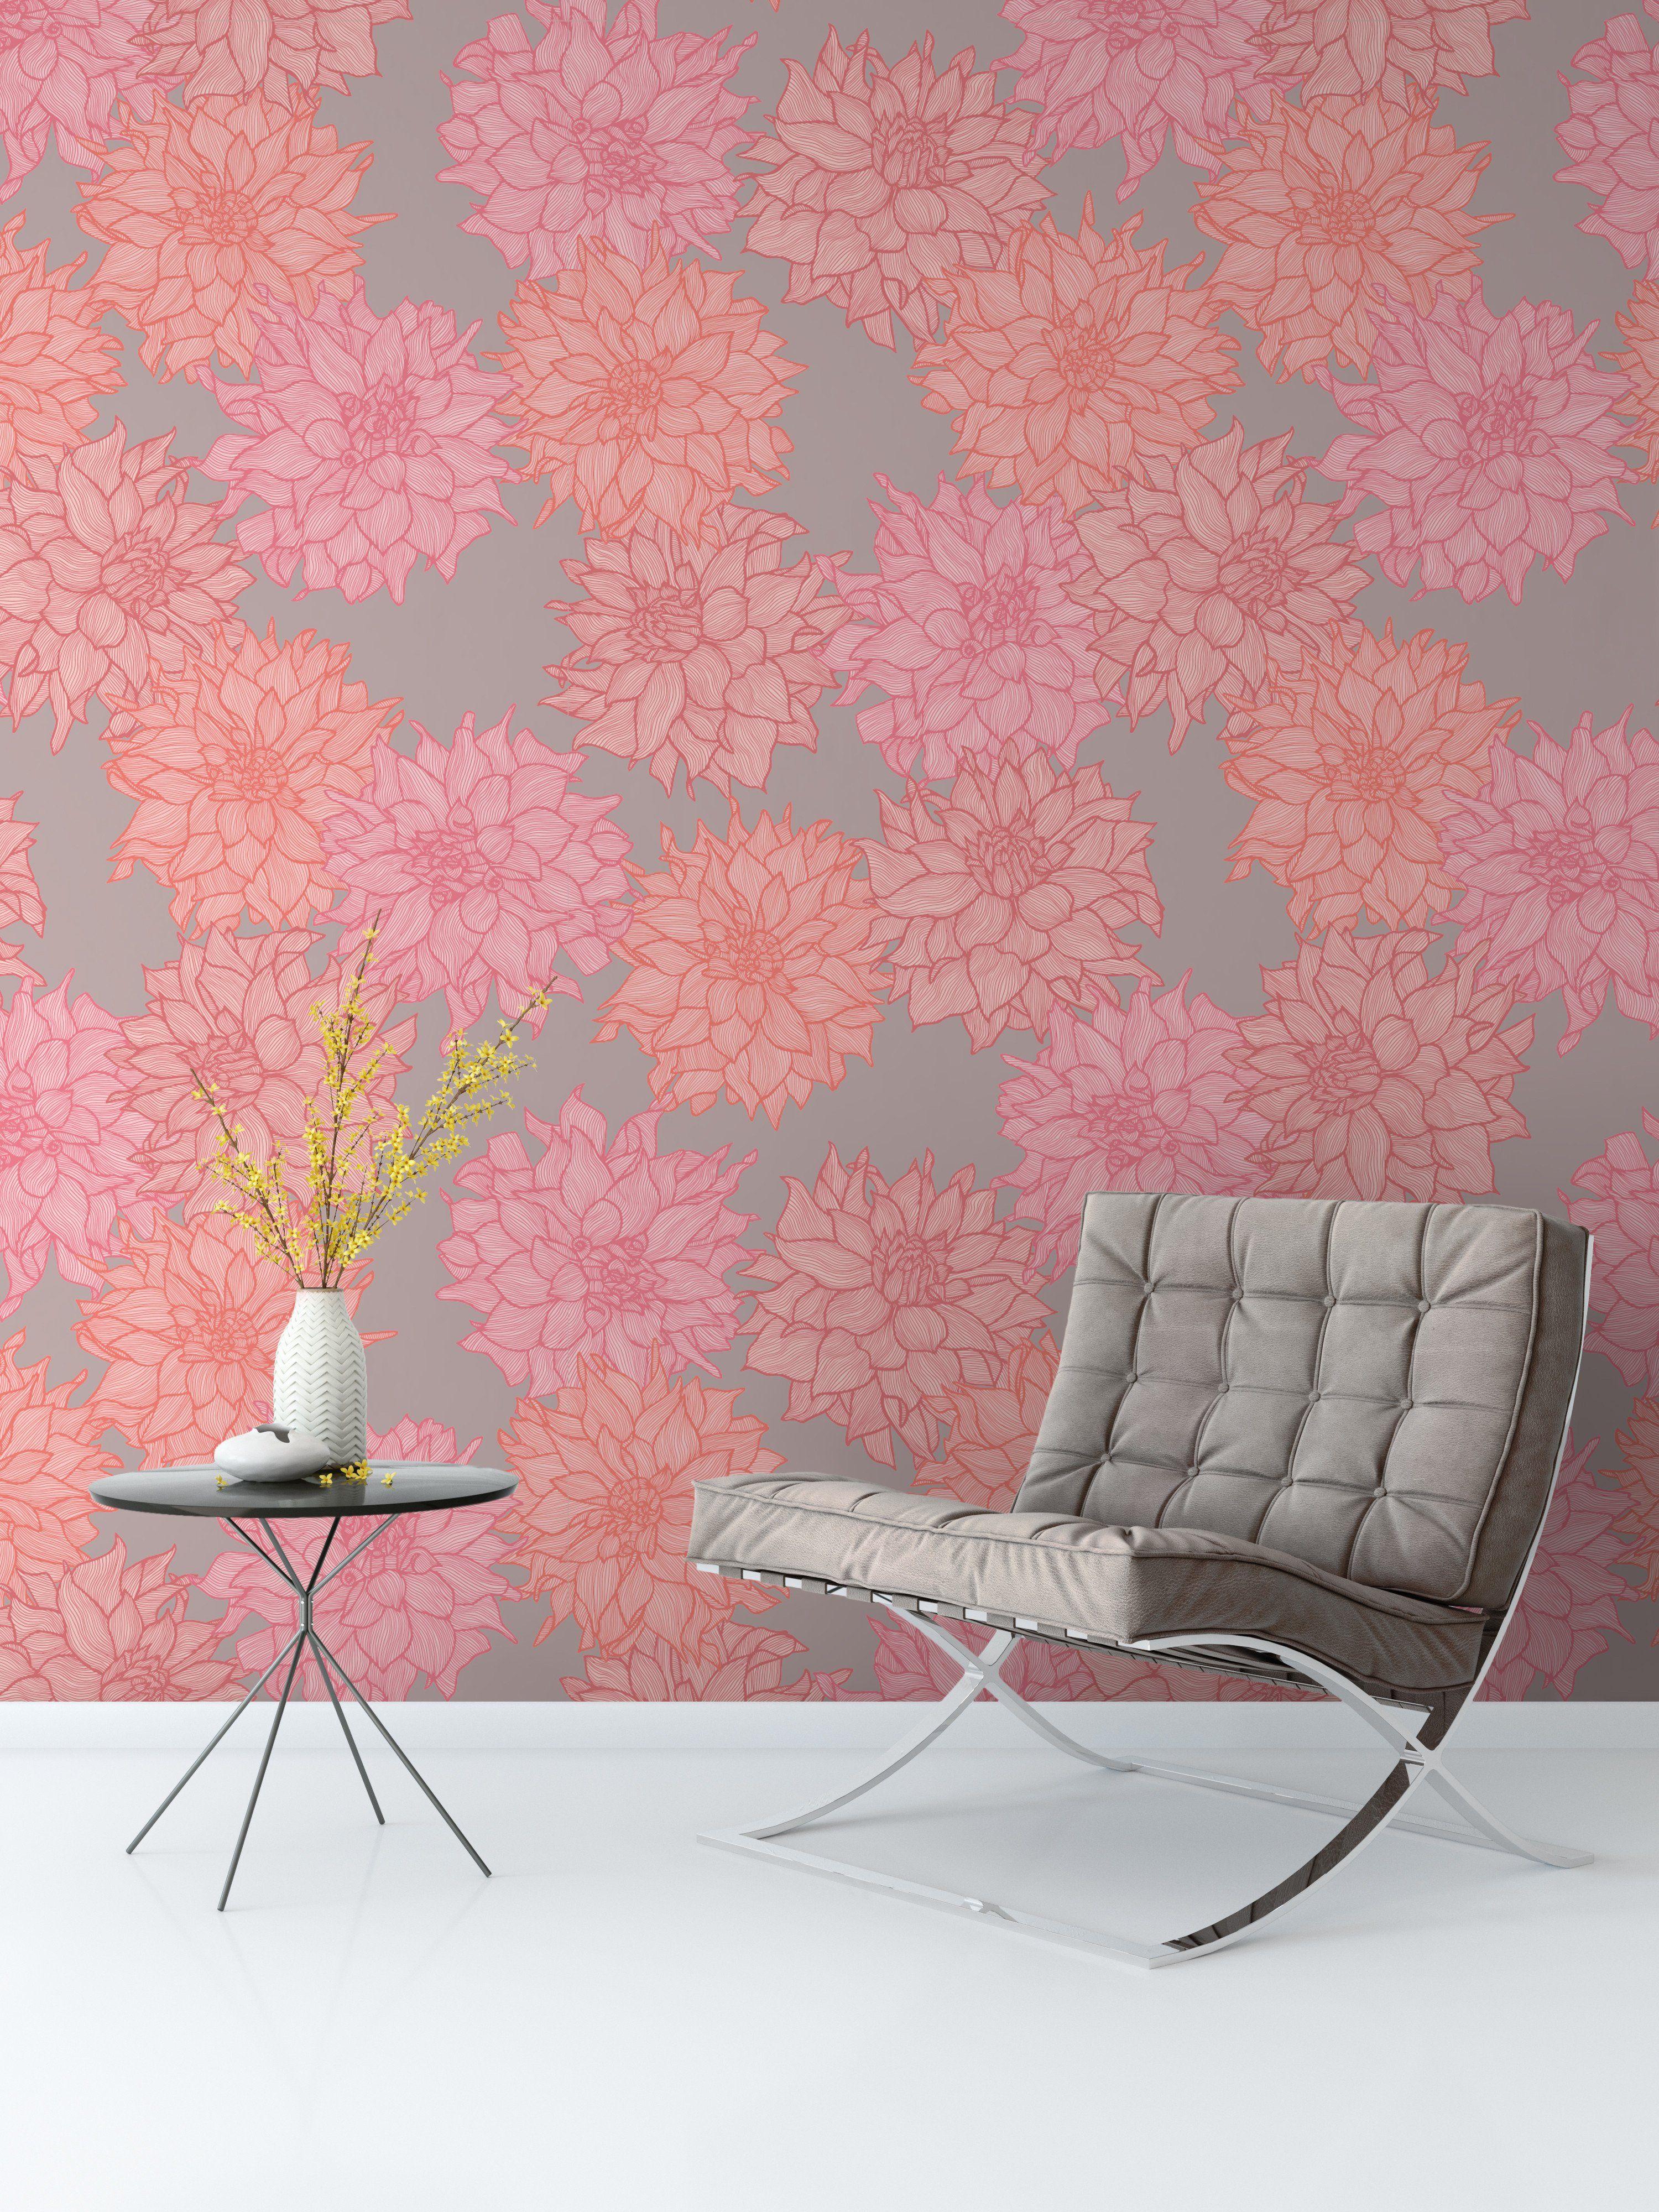 Dahlia Belle Bright Wallpaper Bright Wallpaper Soft Wallp